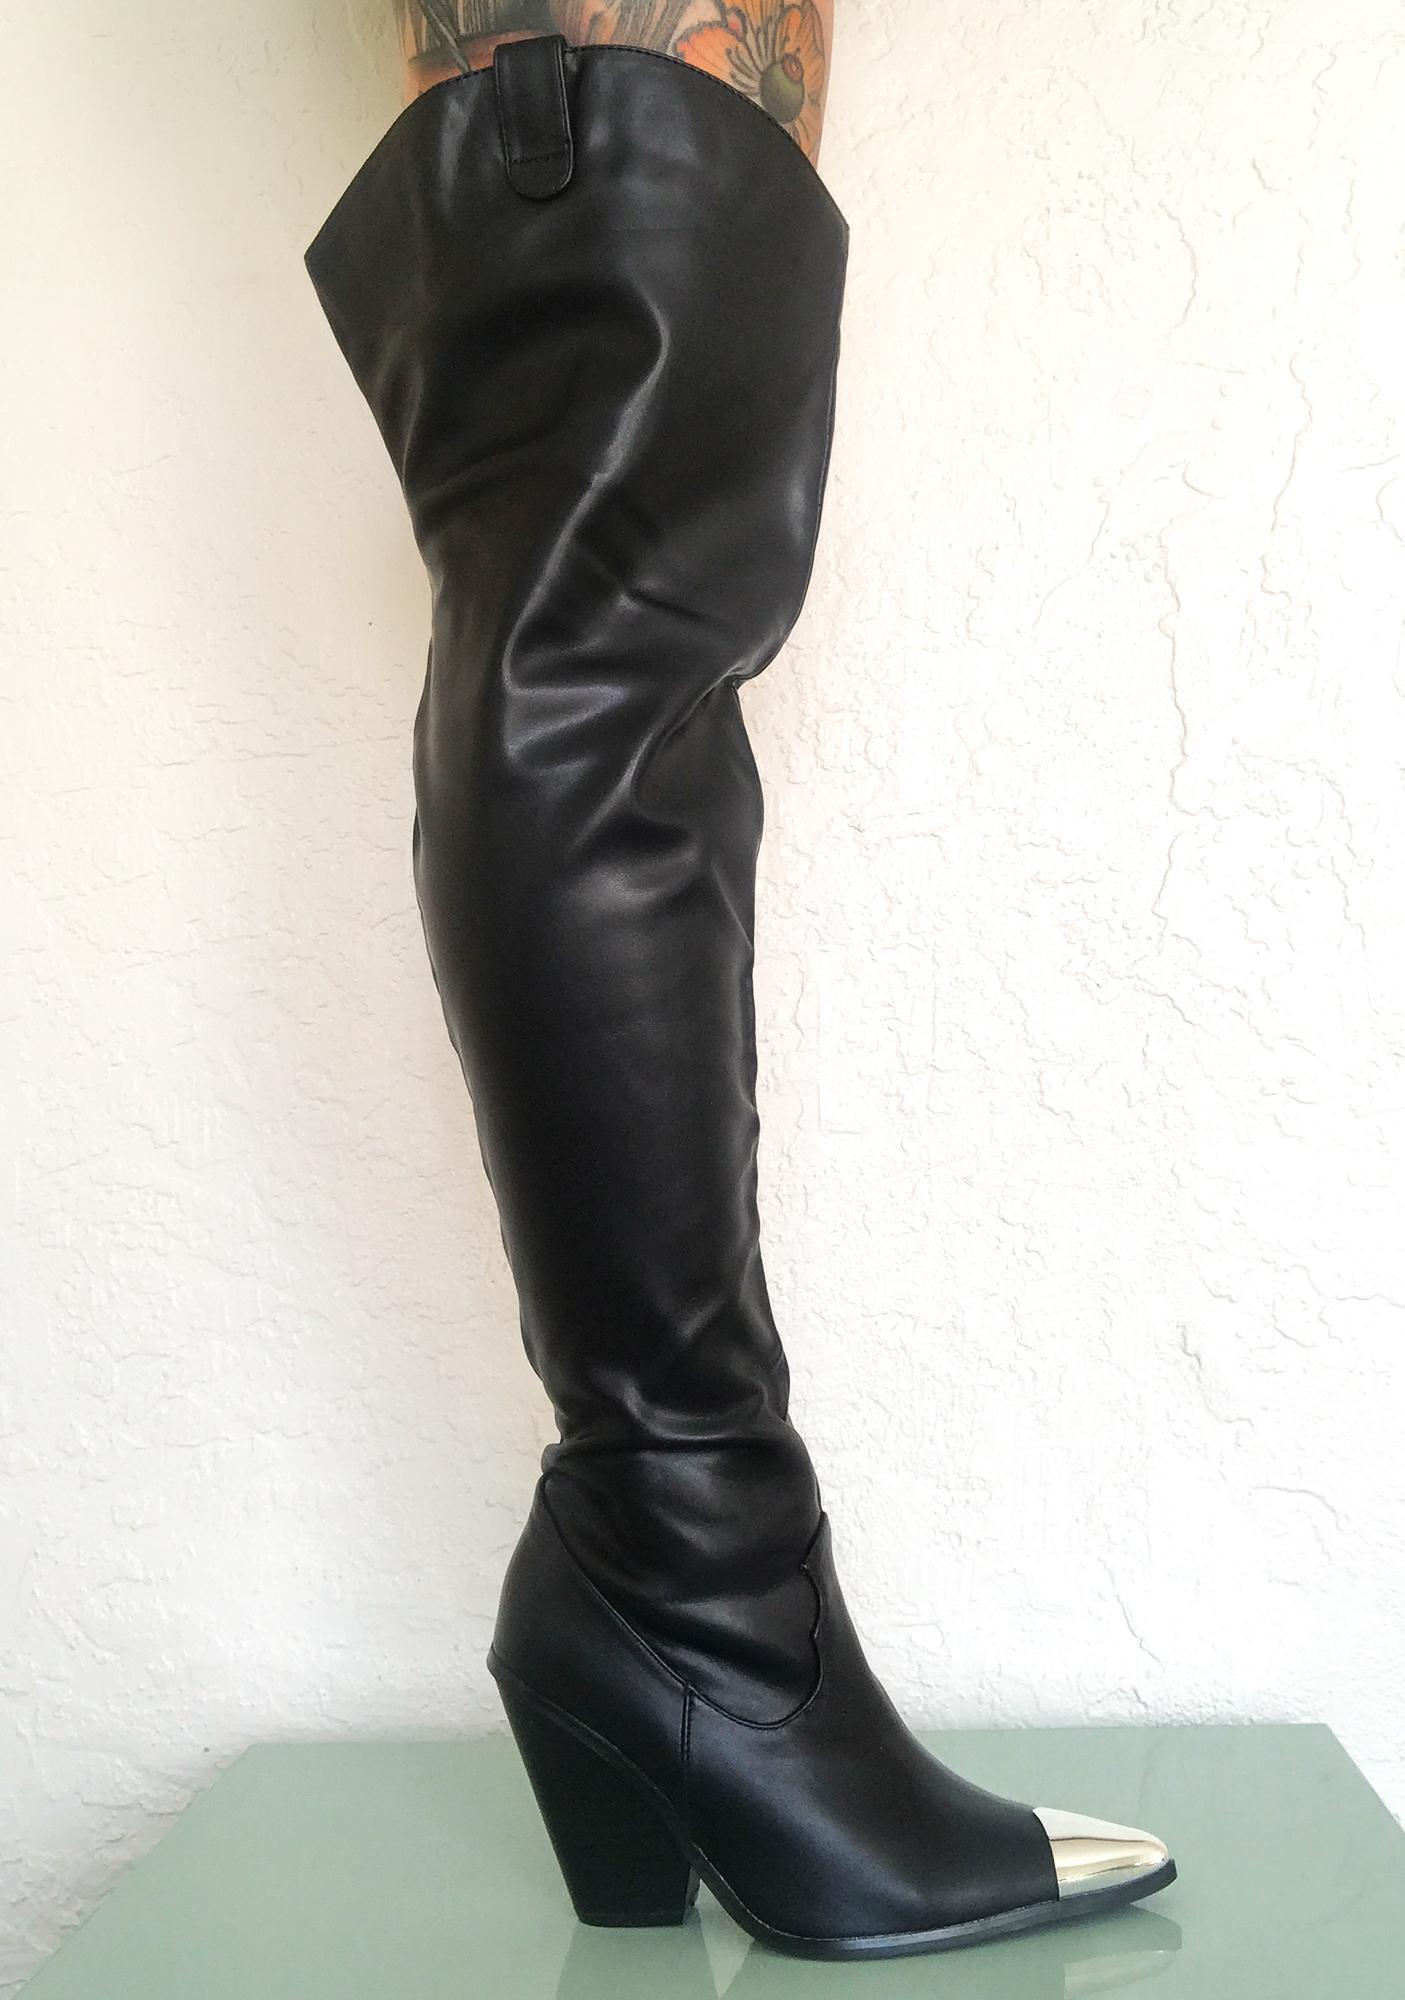 Get Your Kicks Cowboy Boots